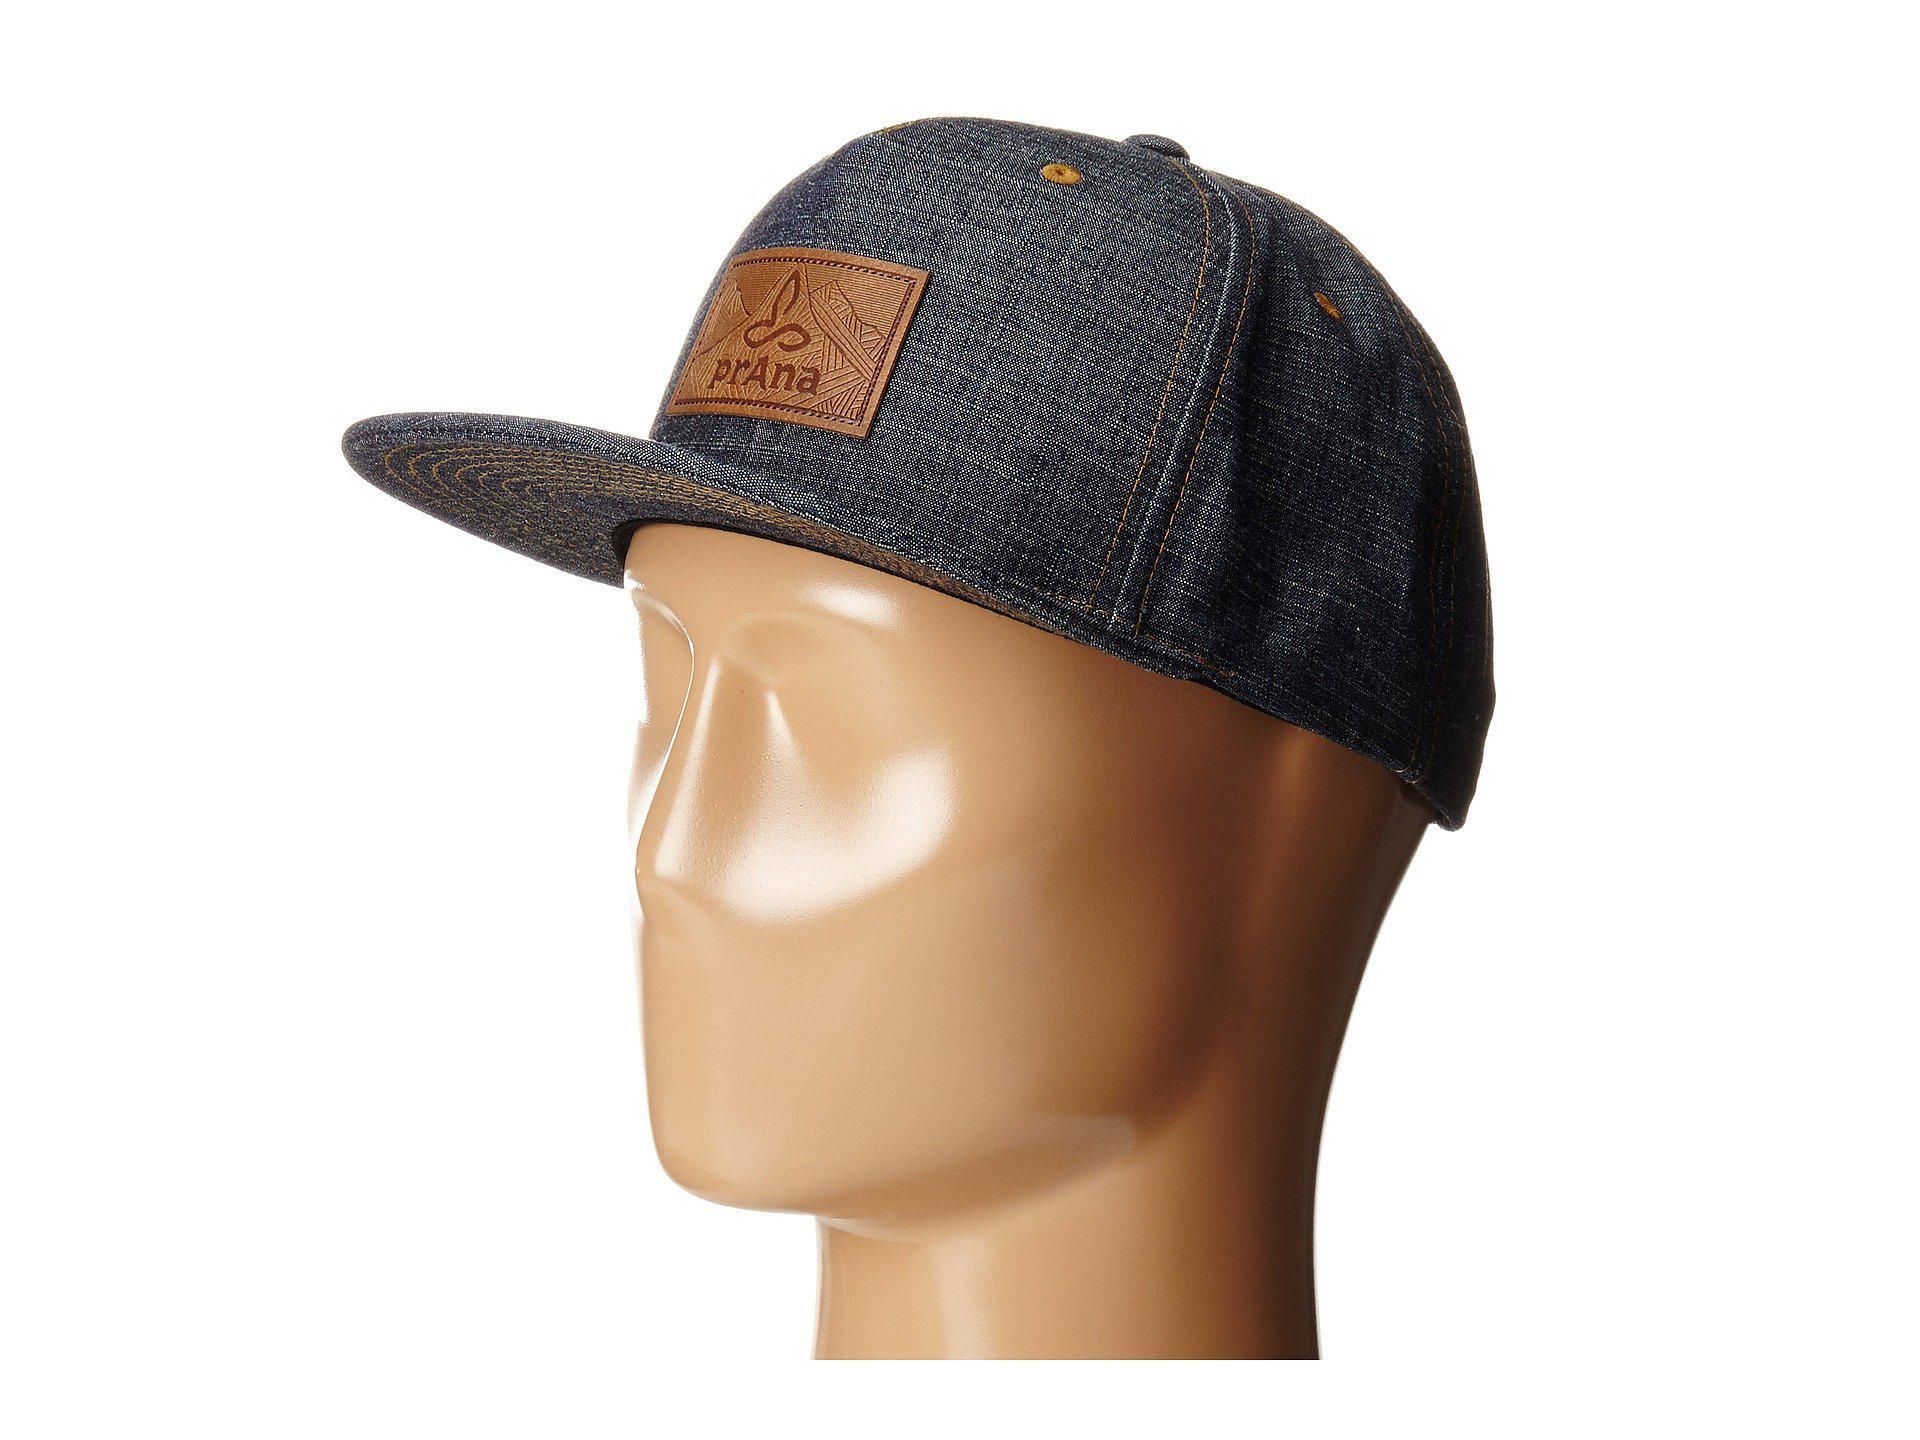 8daff49e Prana Kendal Ball Cap in Blue for Men - Lyst